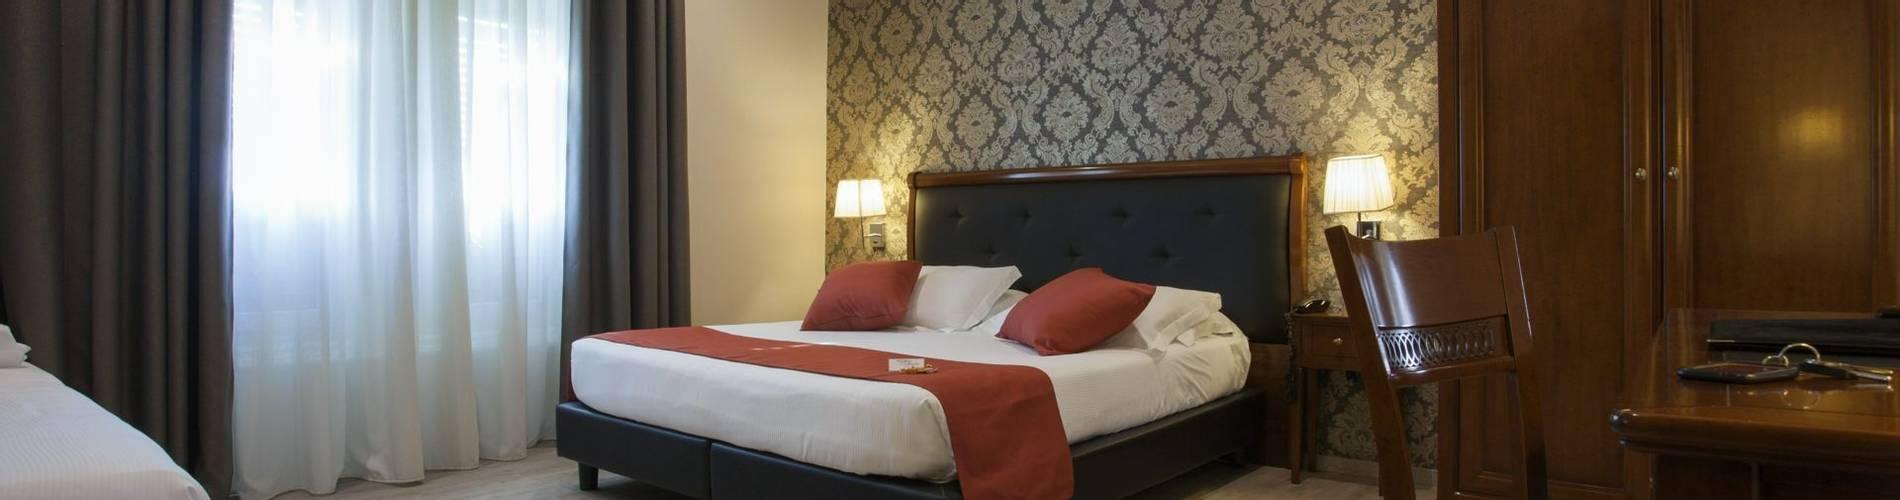 hotel_astoria_rapallo_TPS.jpg